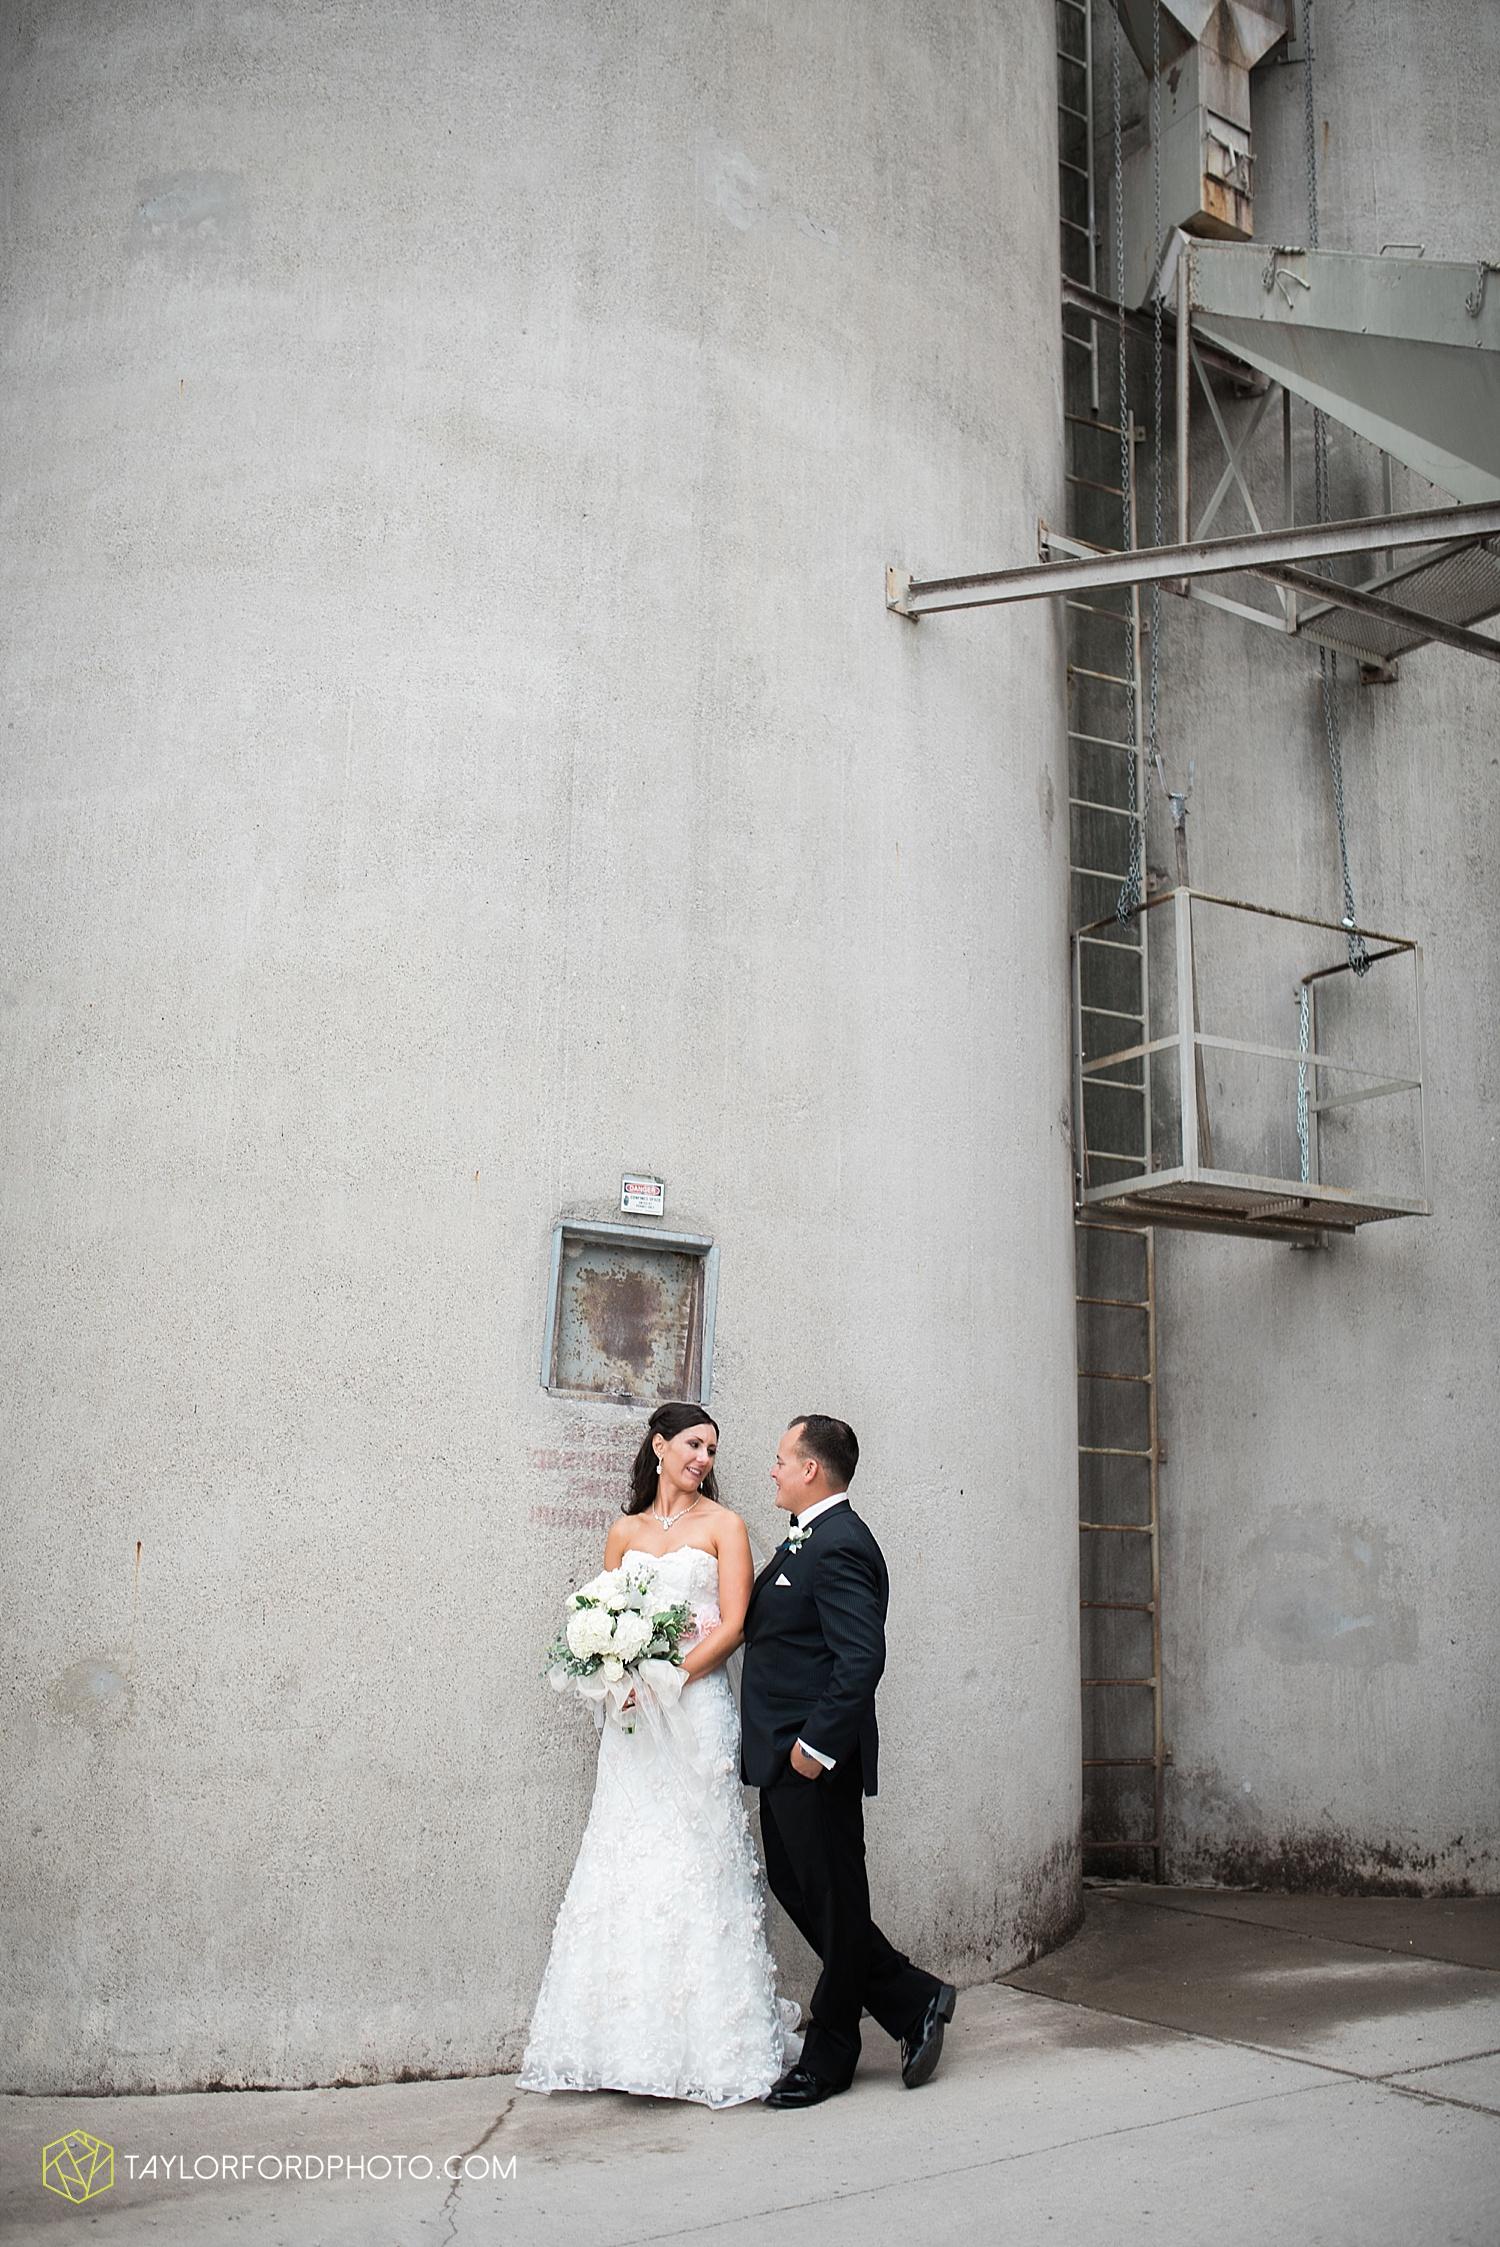 fort_wayne_indiana_wedding_photographer_taylor_ford_dupont_downs_0473.jpg